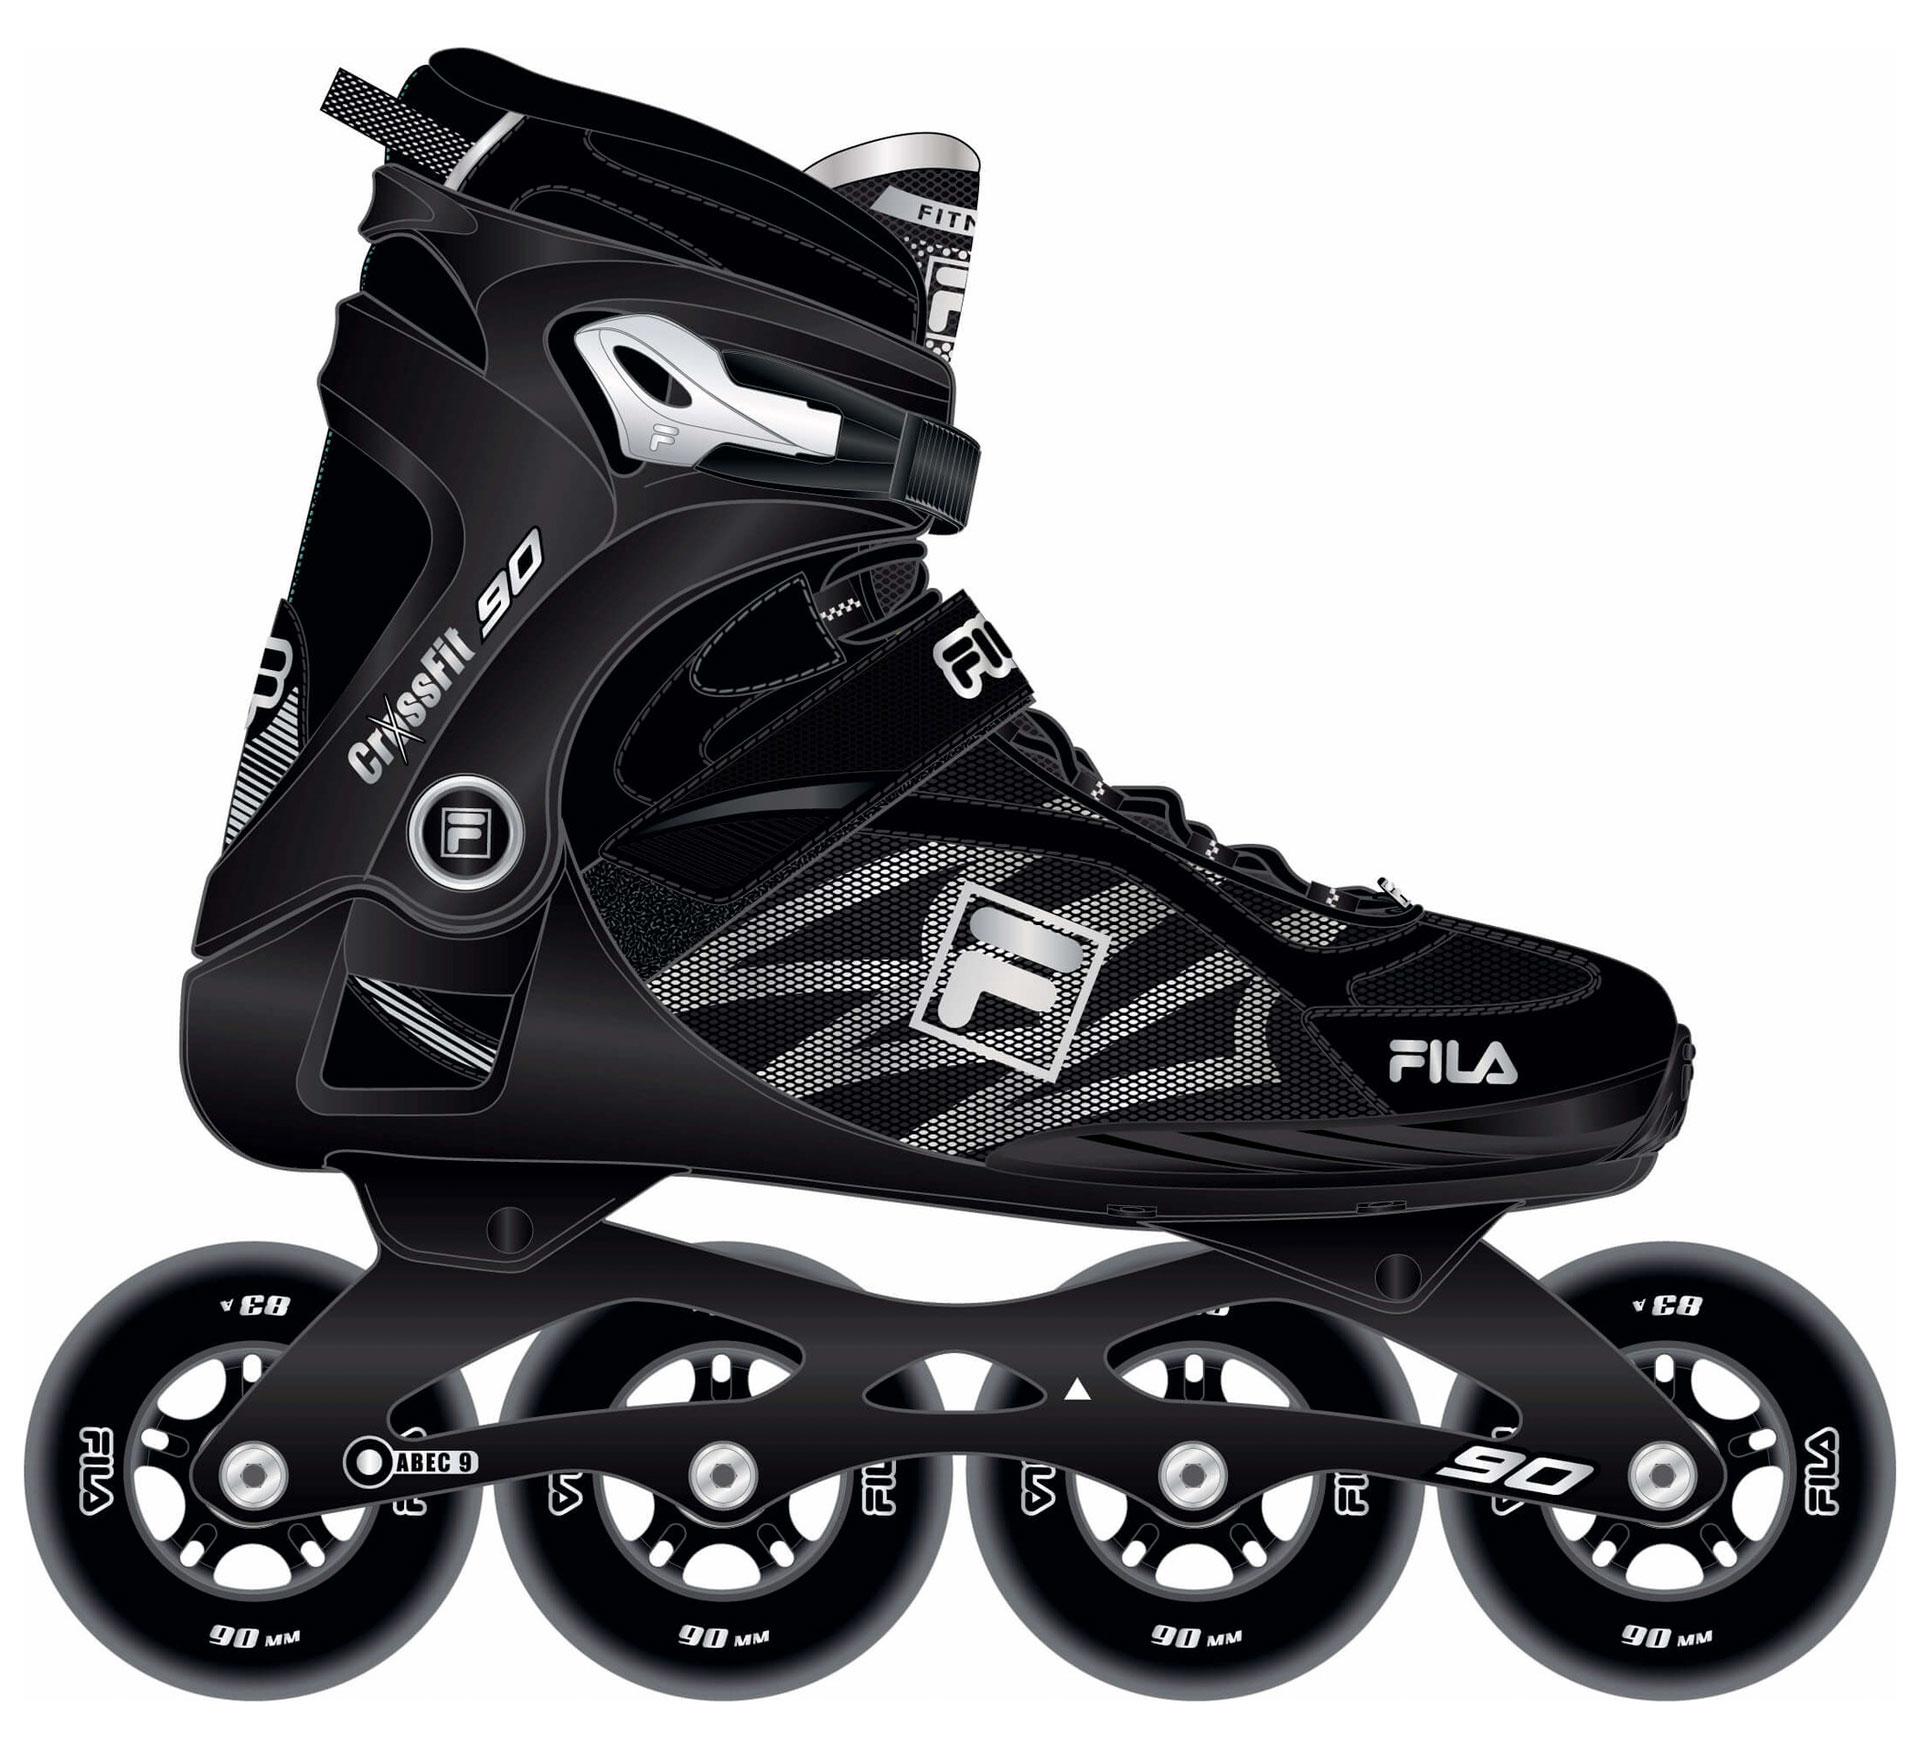 Fila Crossfit 90 Skates